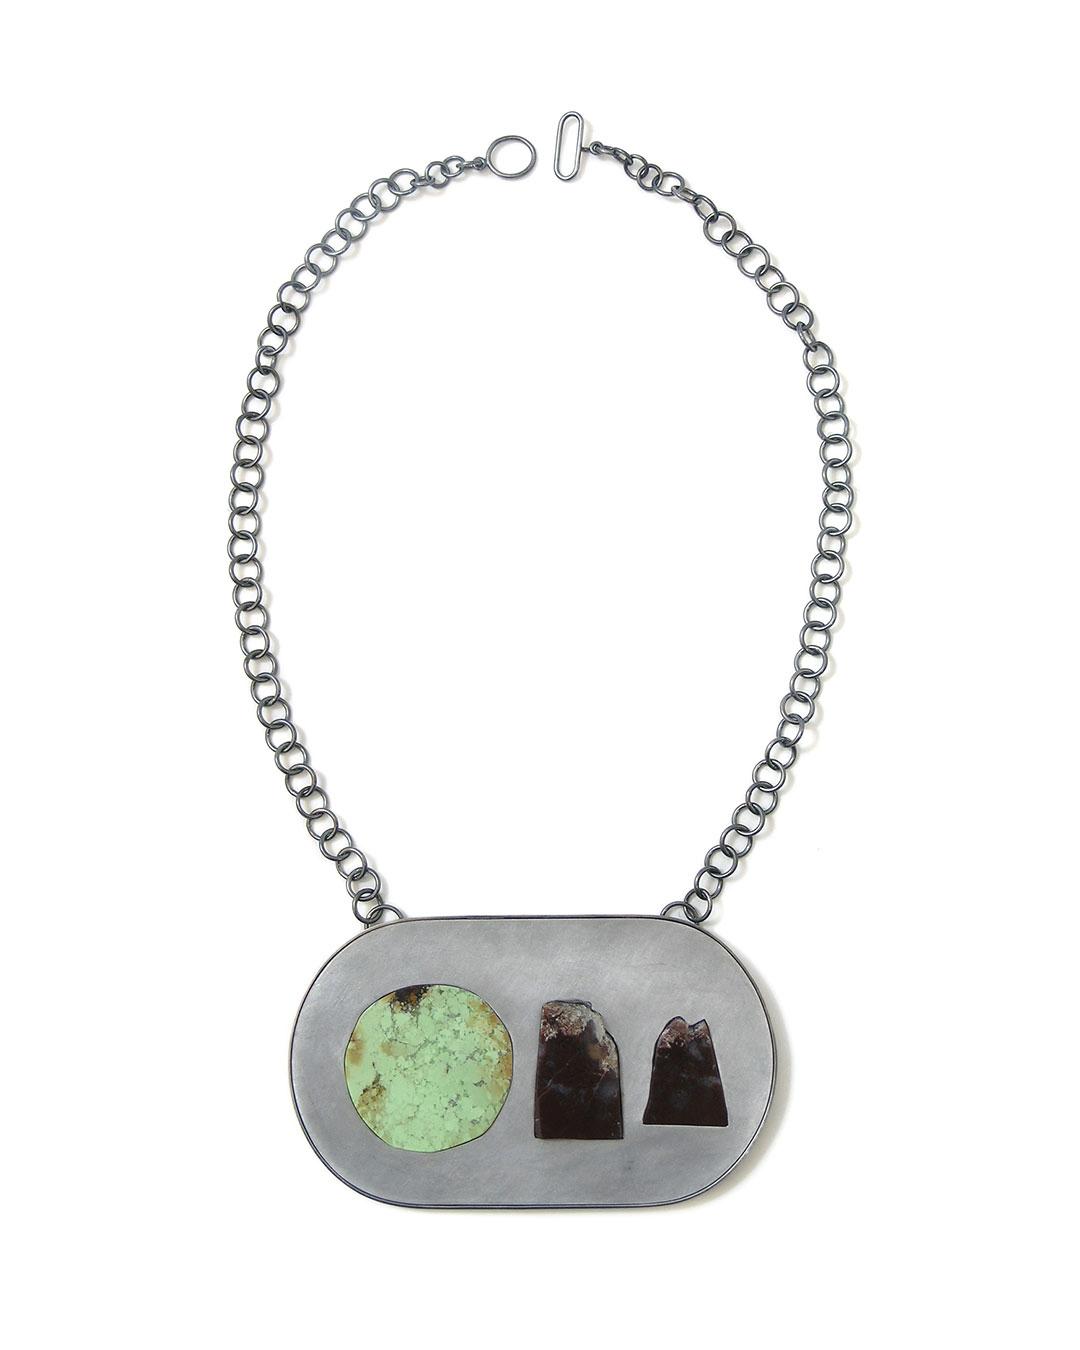 Sybille Richter, Ravary, 2008, necklace; silver, aluminium, chrysoprase, agate, 68 x 115 x 5 mm, €1410